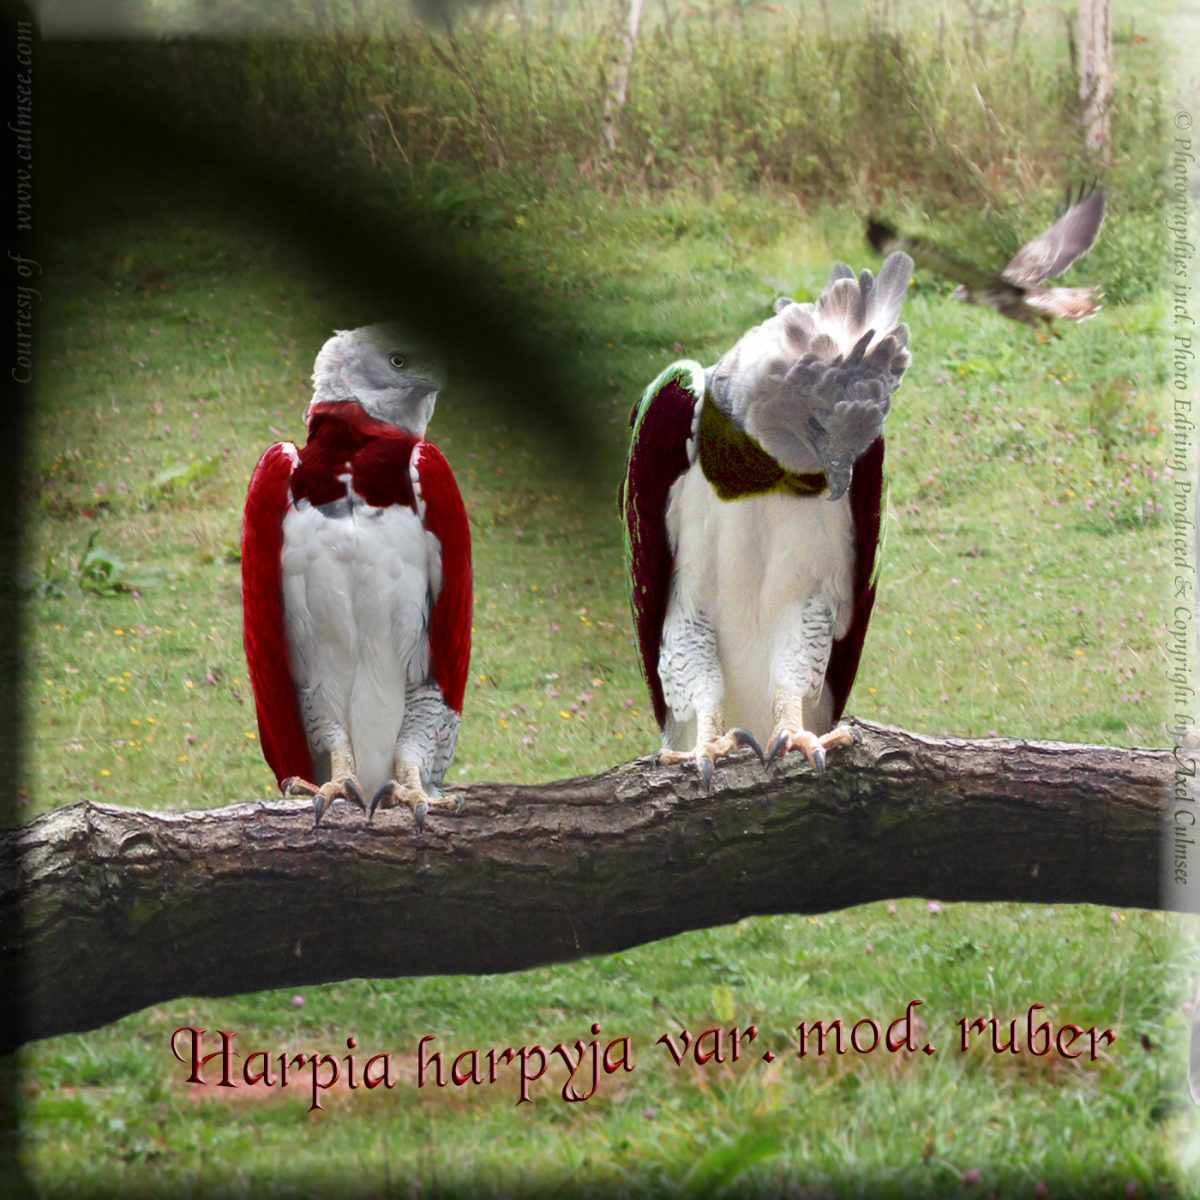 Harpia harpyja var. mod. ruber